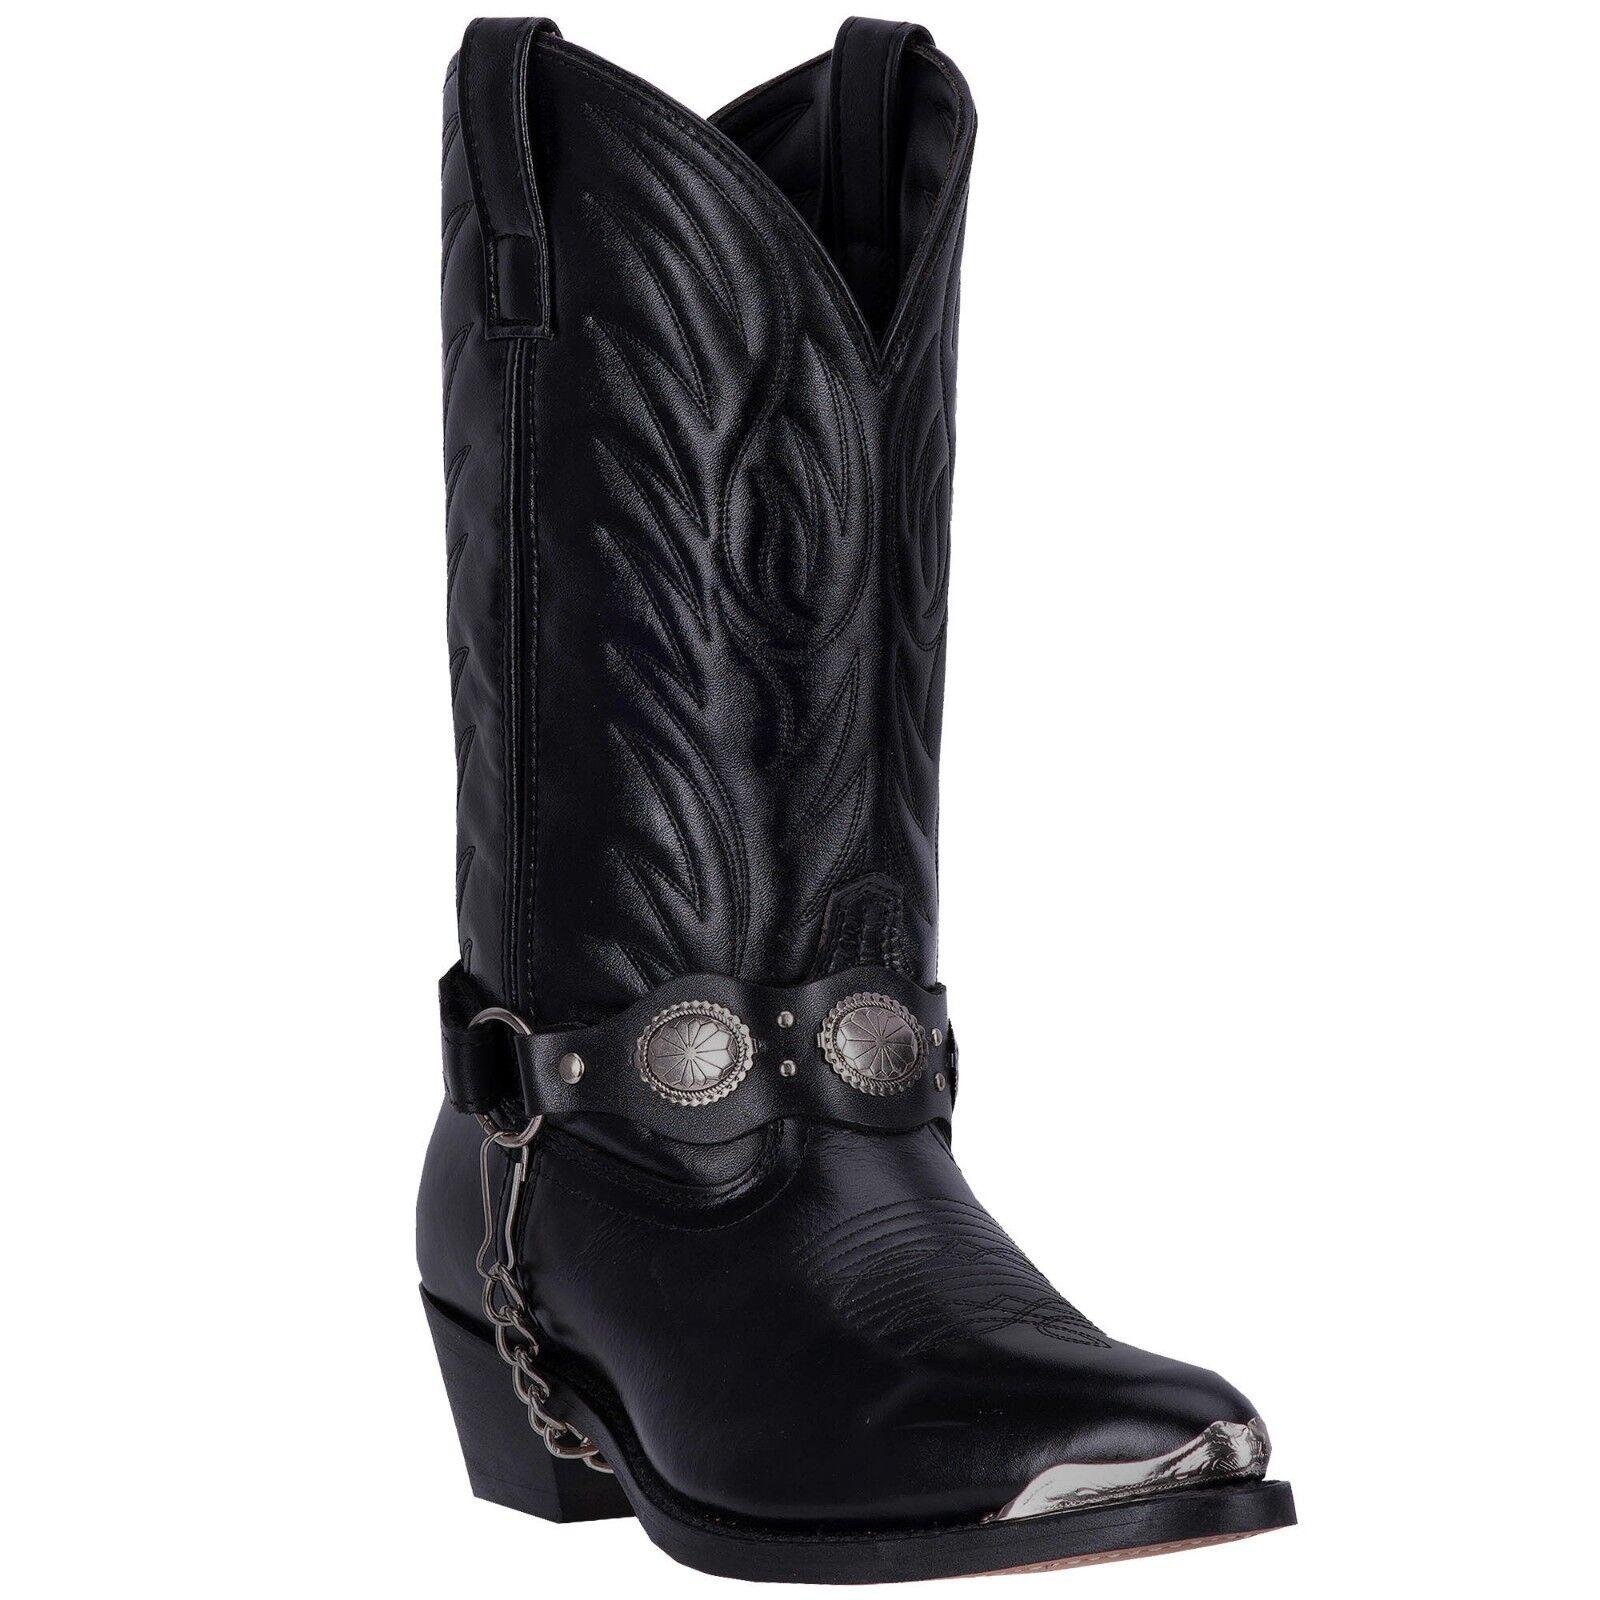 Laredo sizehassee 01-6770-BK Men's 12  Black Leather Cowboy Boots